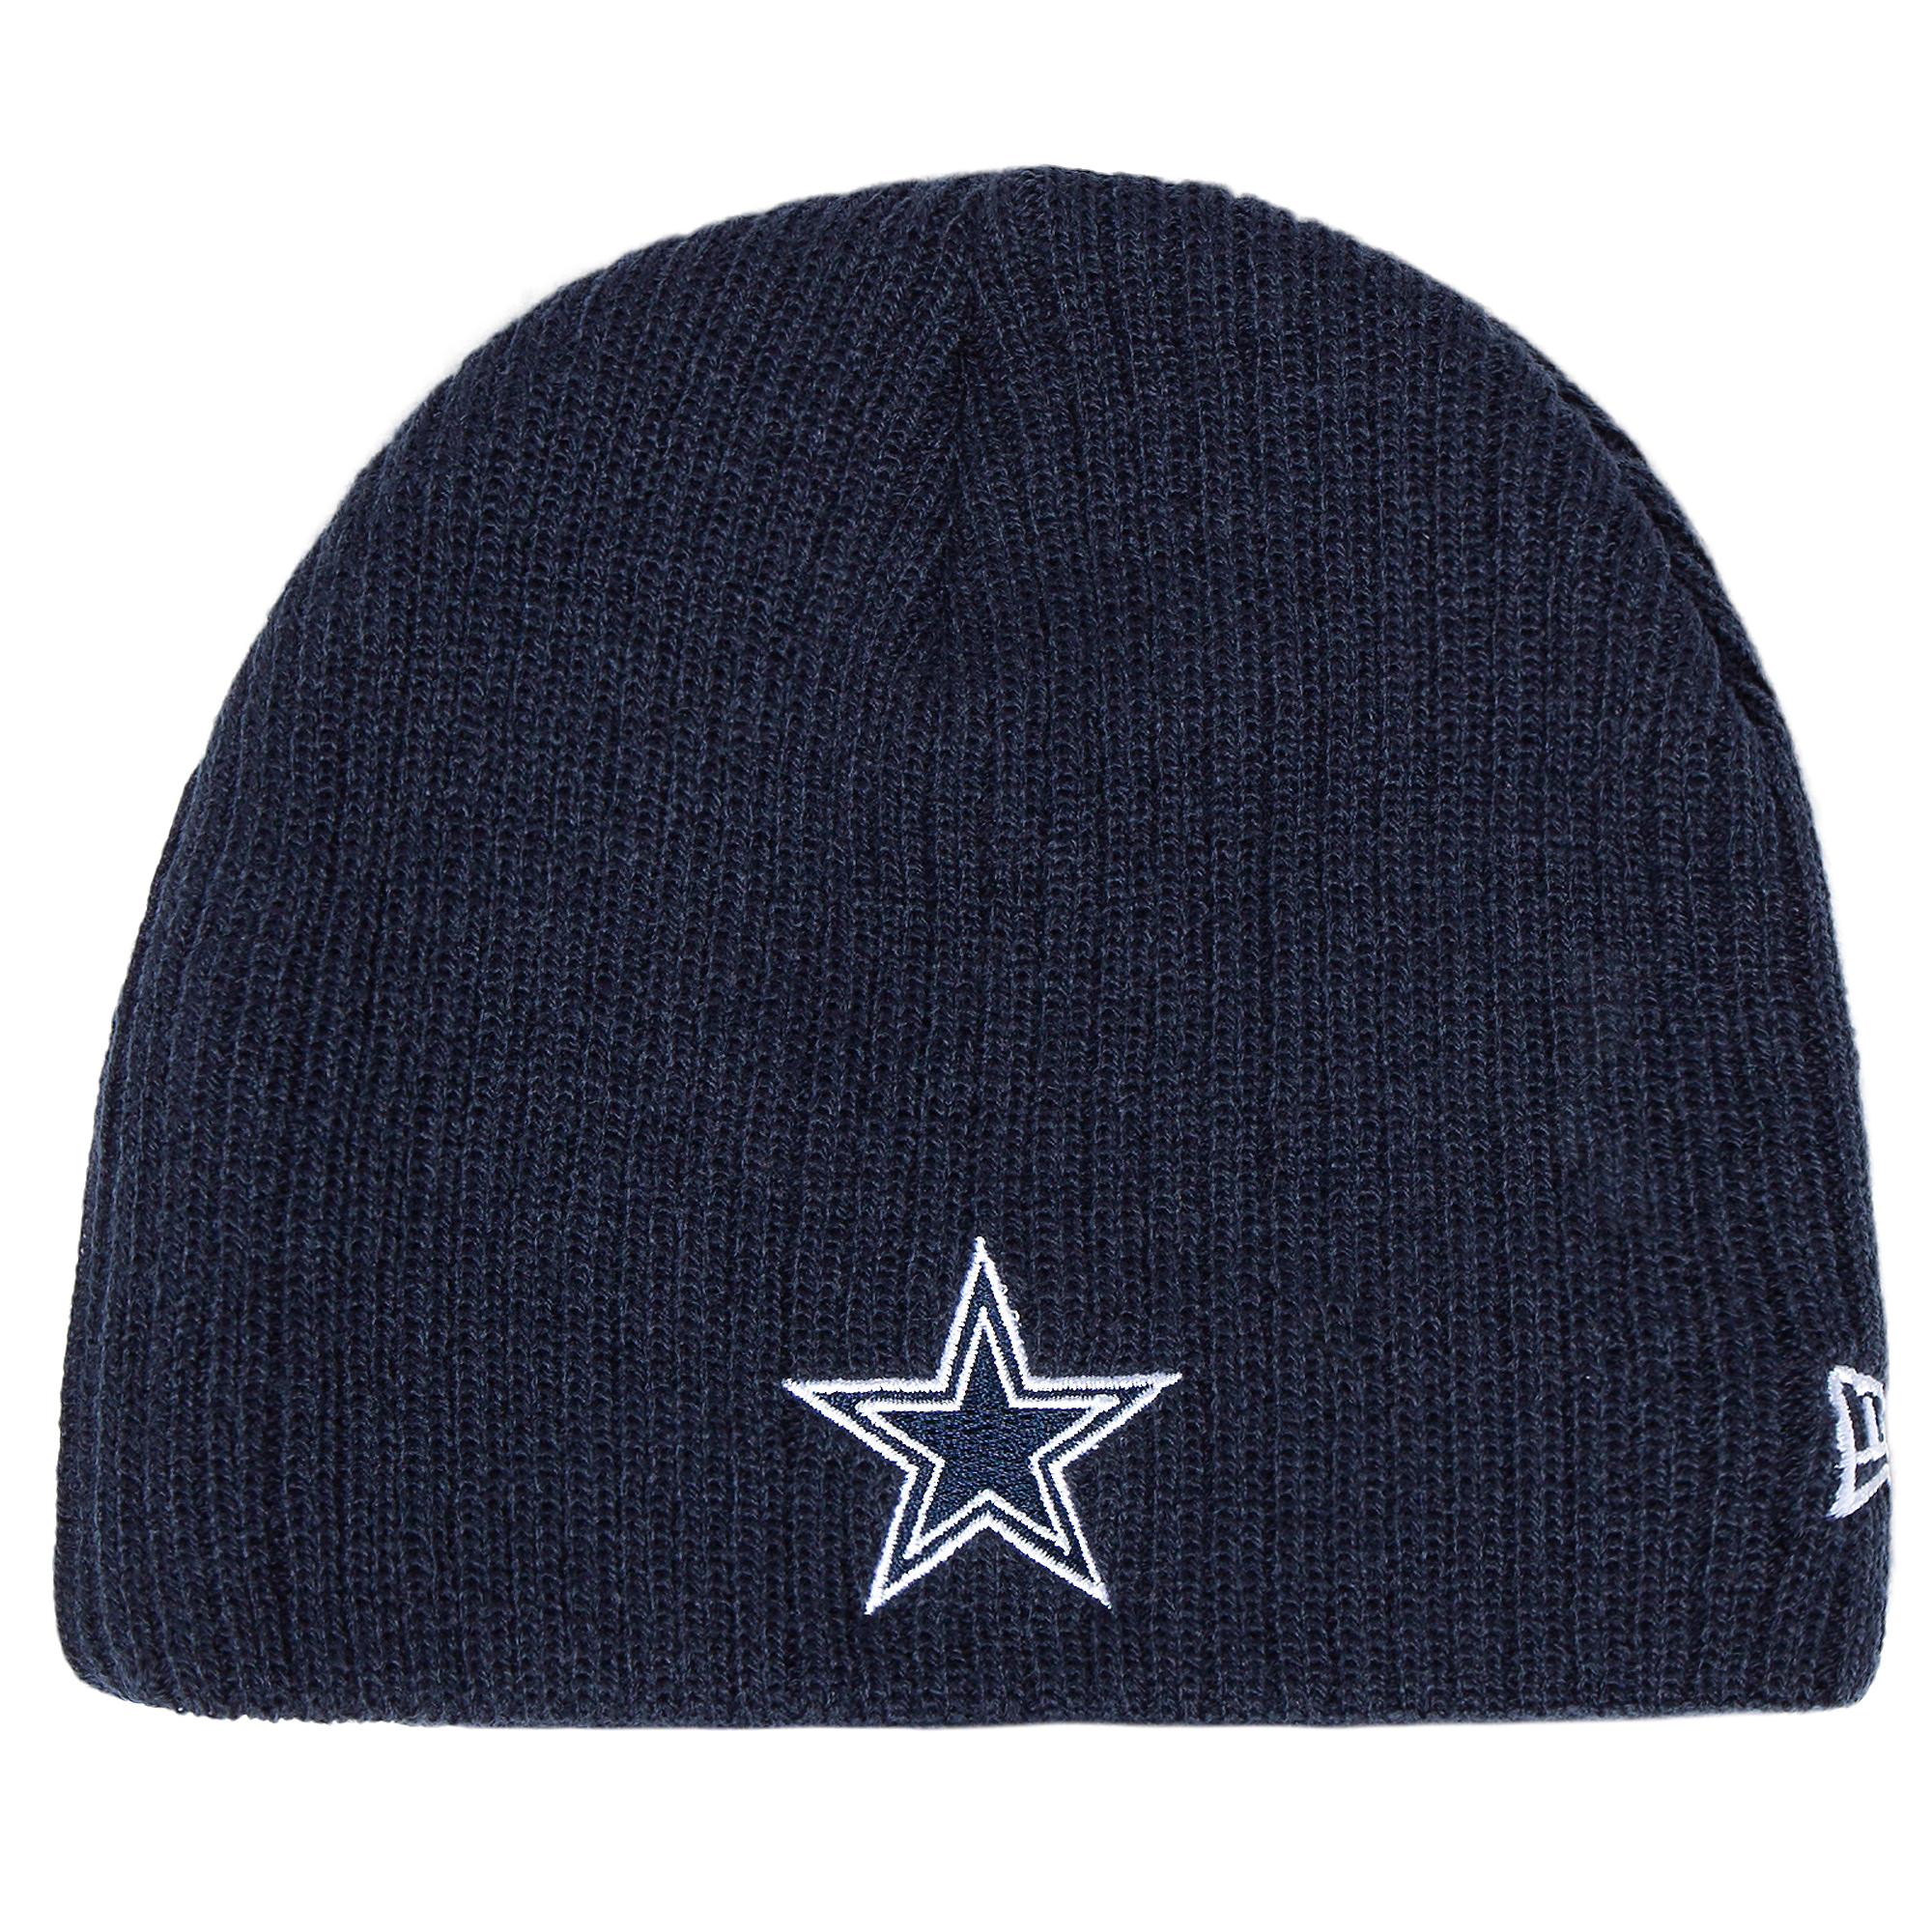 Dallas Cowboys New Era Infant Mini Knit Hat